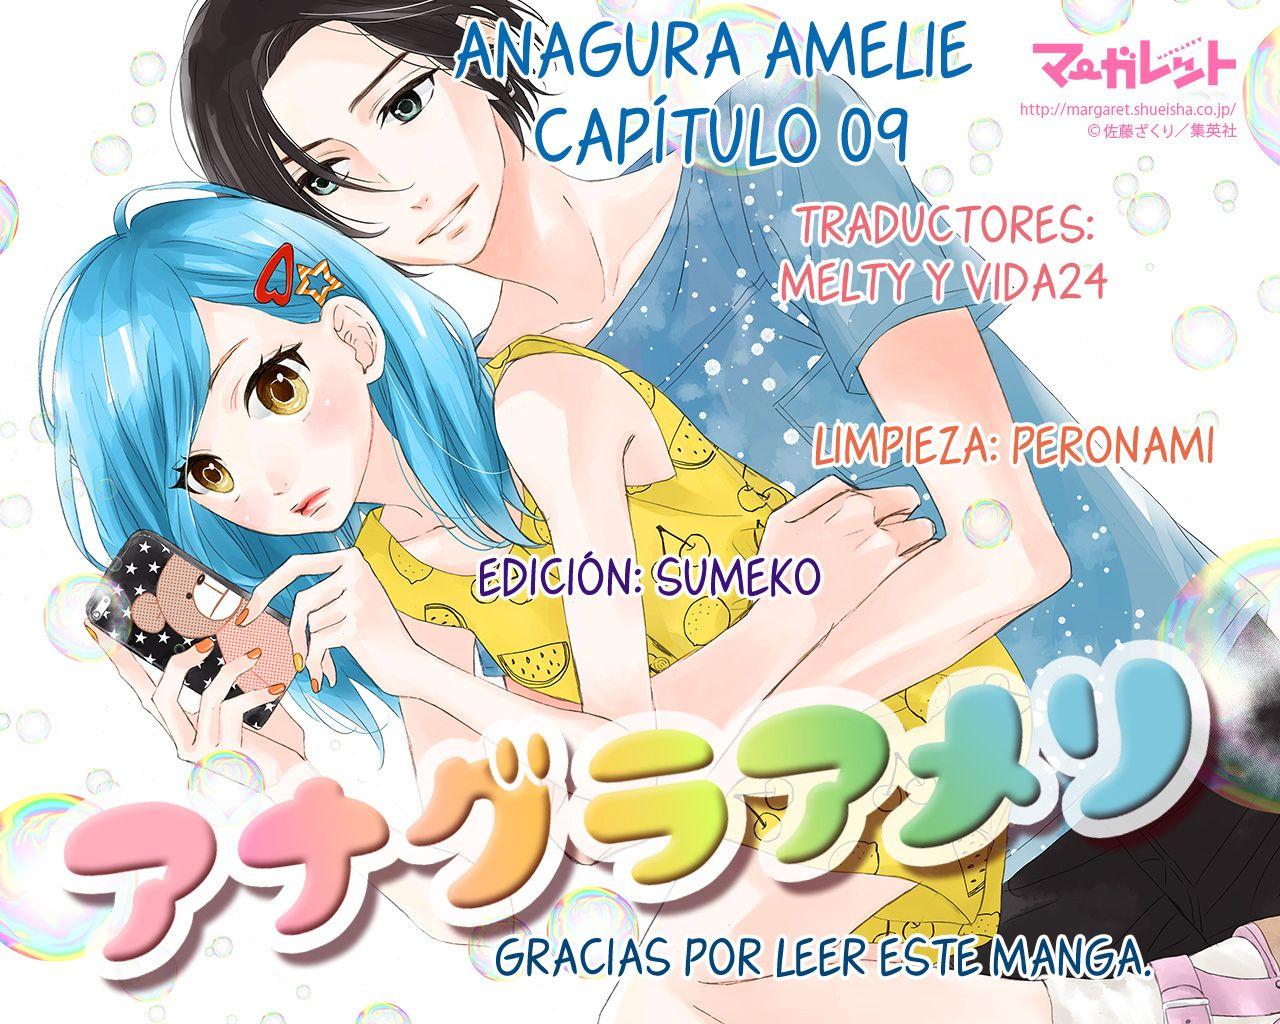 http://c5.ninemanga.com/es_manga/pic2/19/19347/512646/e776712e1379f5120bcb913c19e65f5e.jpg Page 1